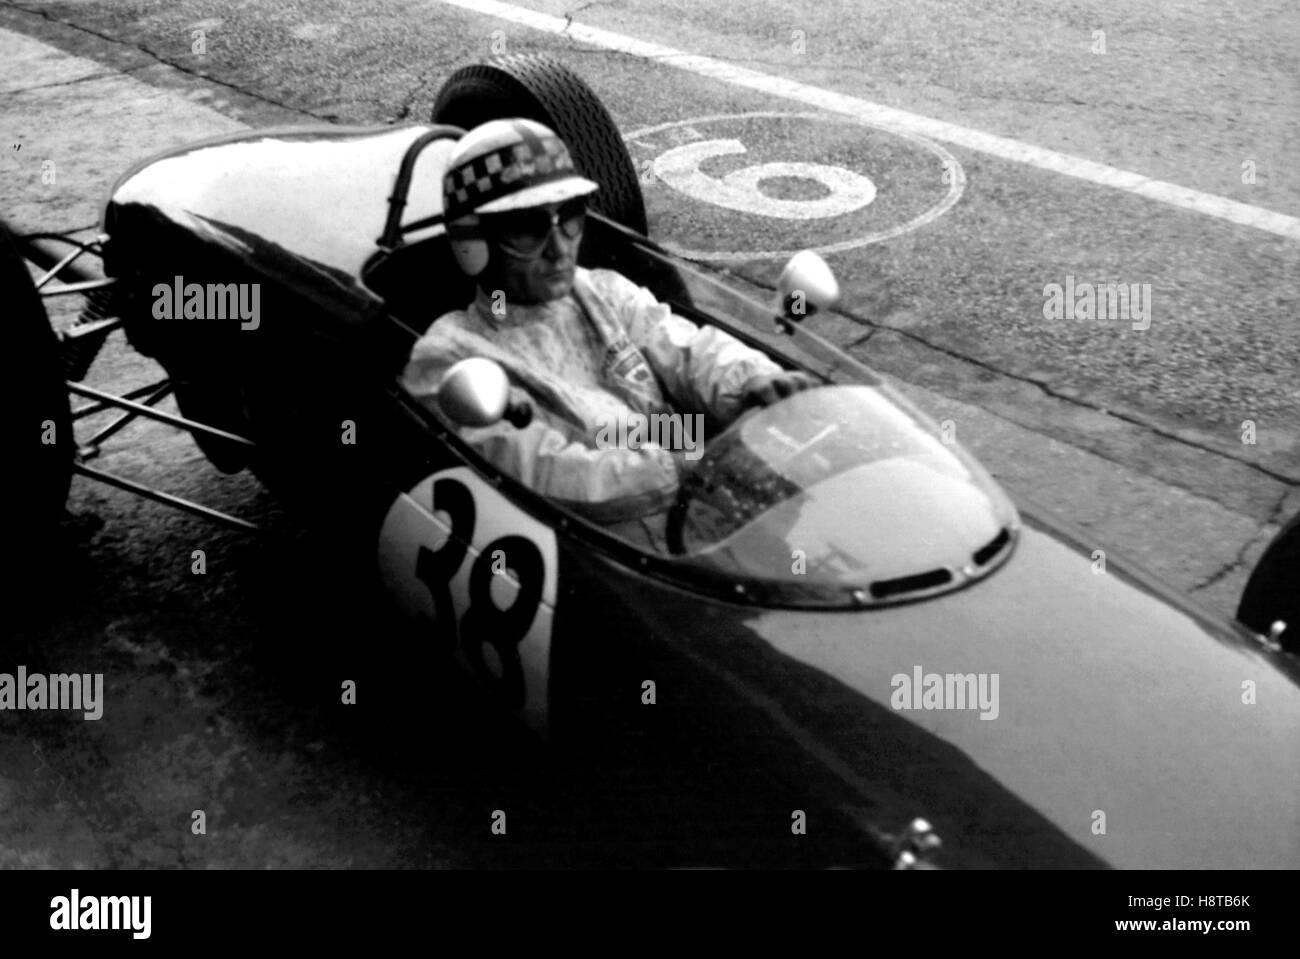 1961 ITALIAN GP IRELAND LOTUS POOR - Stock Image